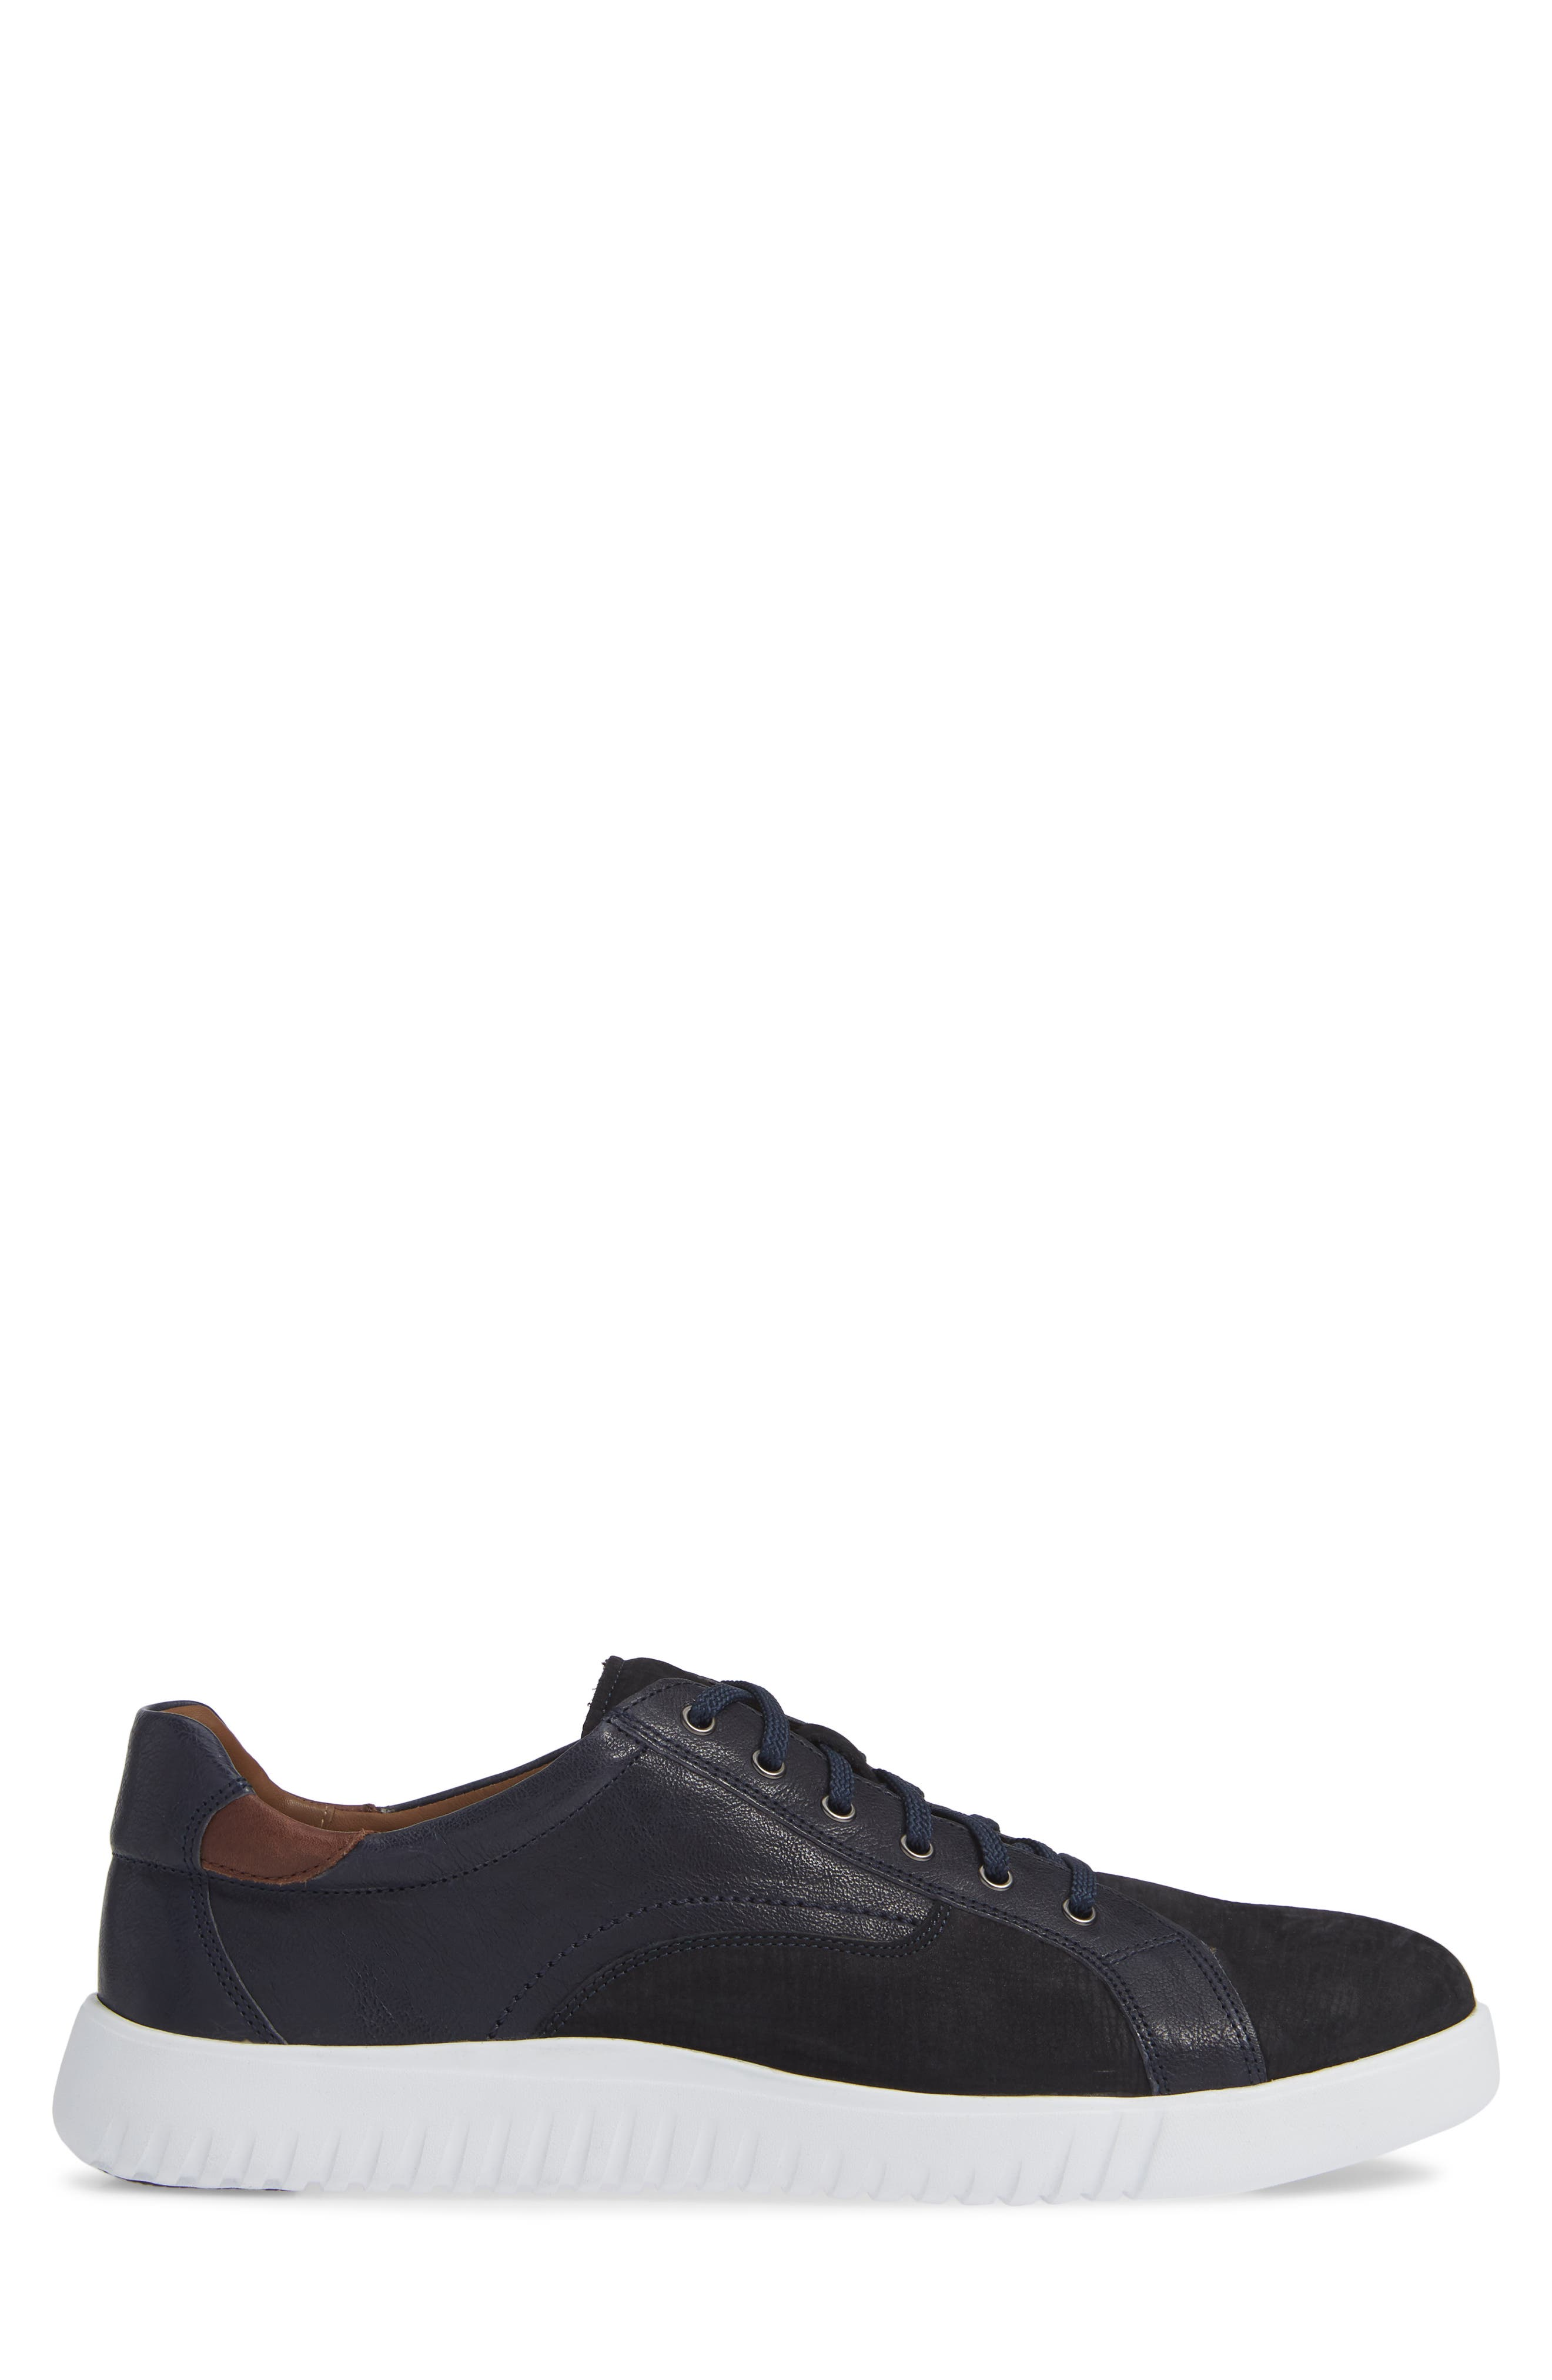 JOHNSTON & MURPHY, McFarland Sneaker, Alternate thumbnail 3, color, NAVY NUBUCK